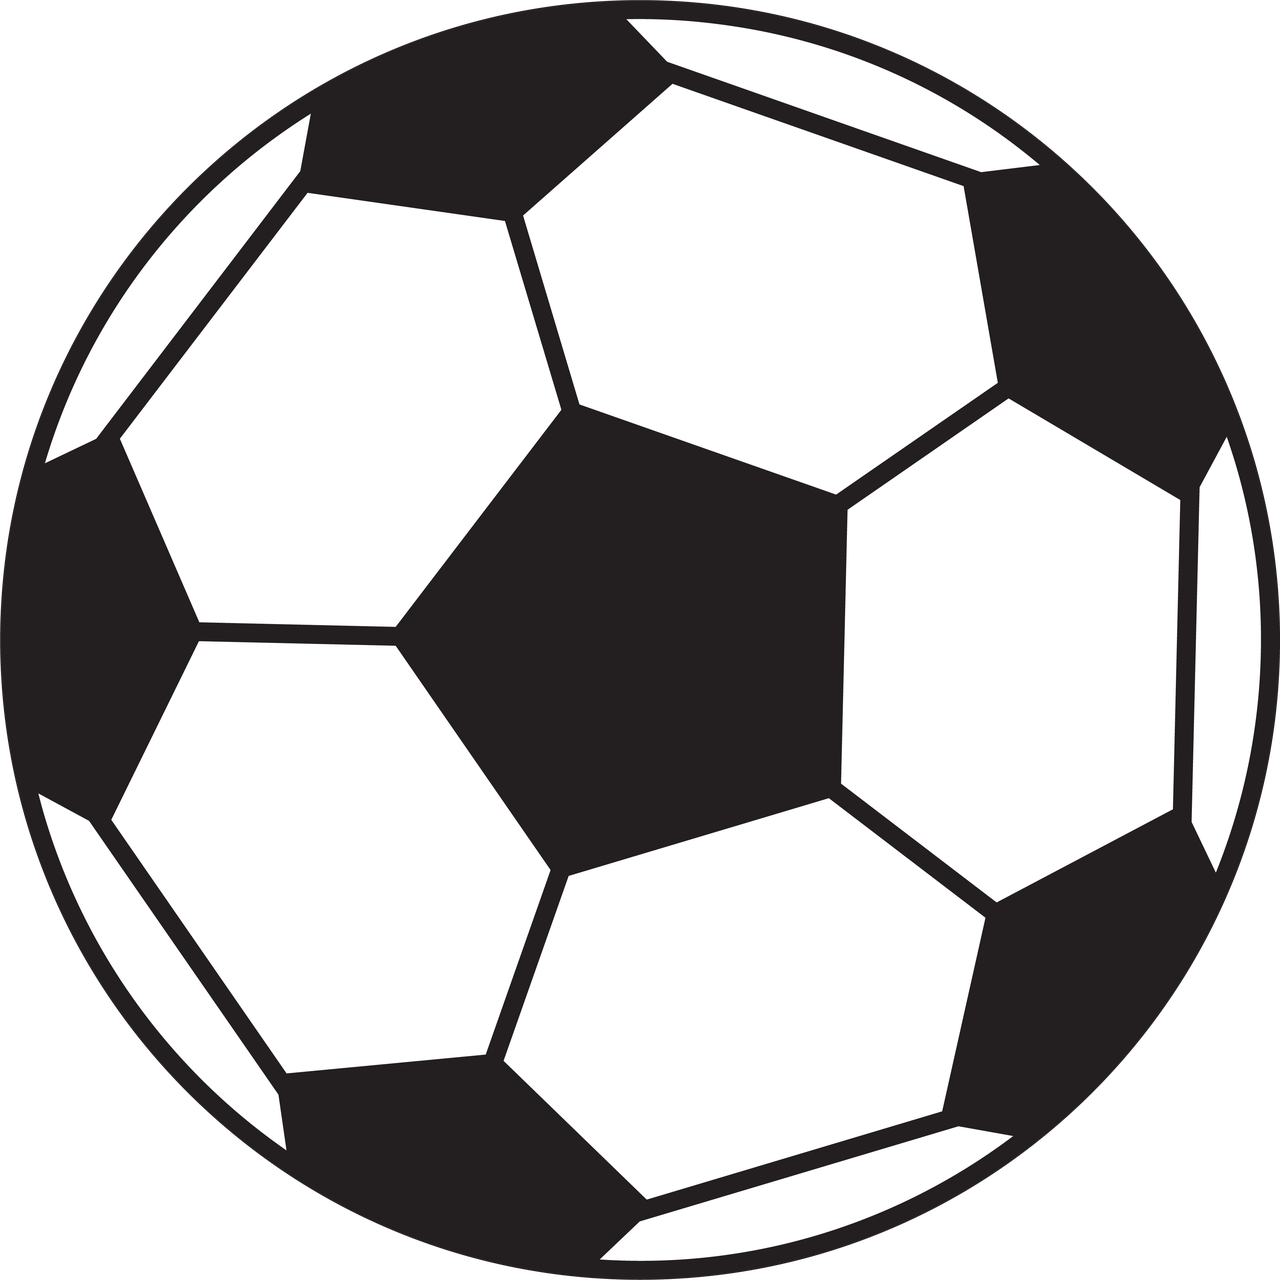 Soccer Ball #2 SVG Cut File